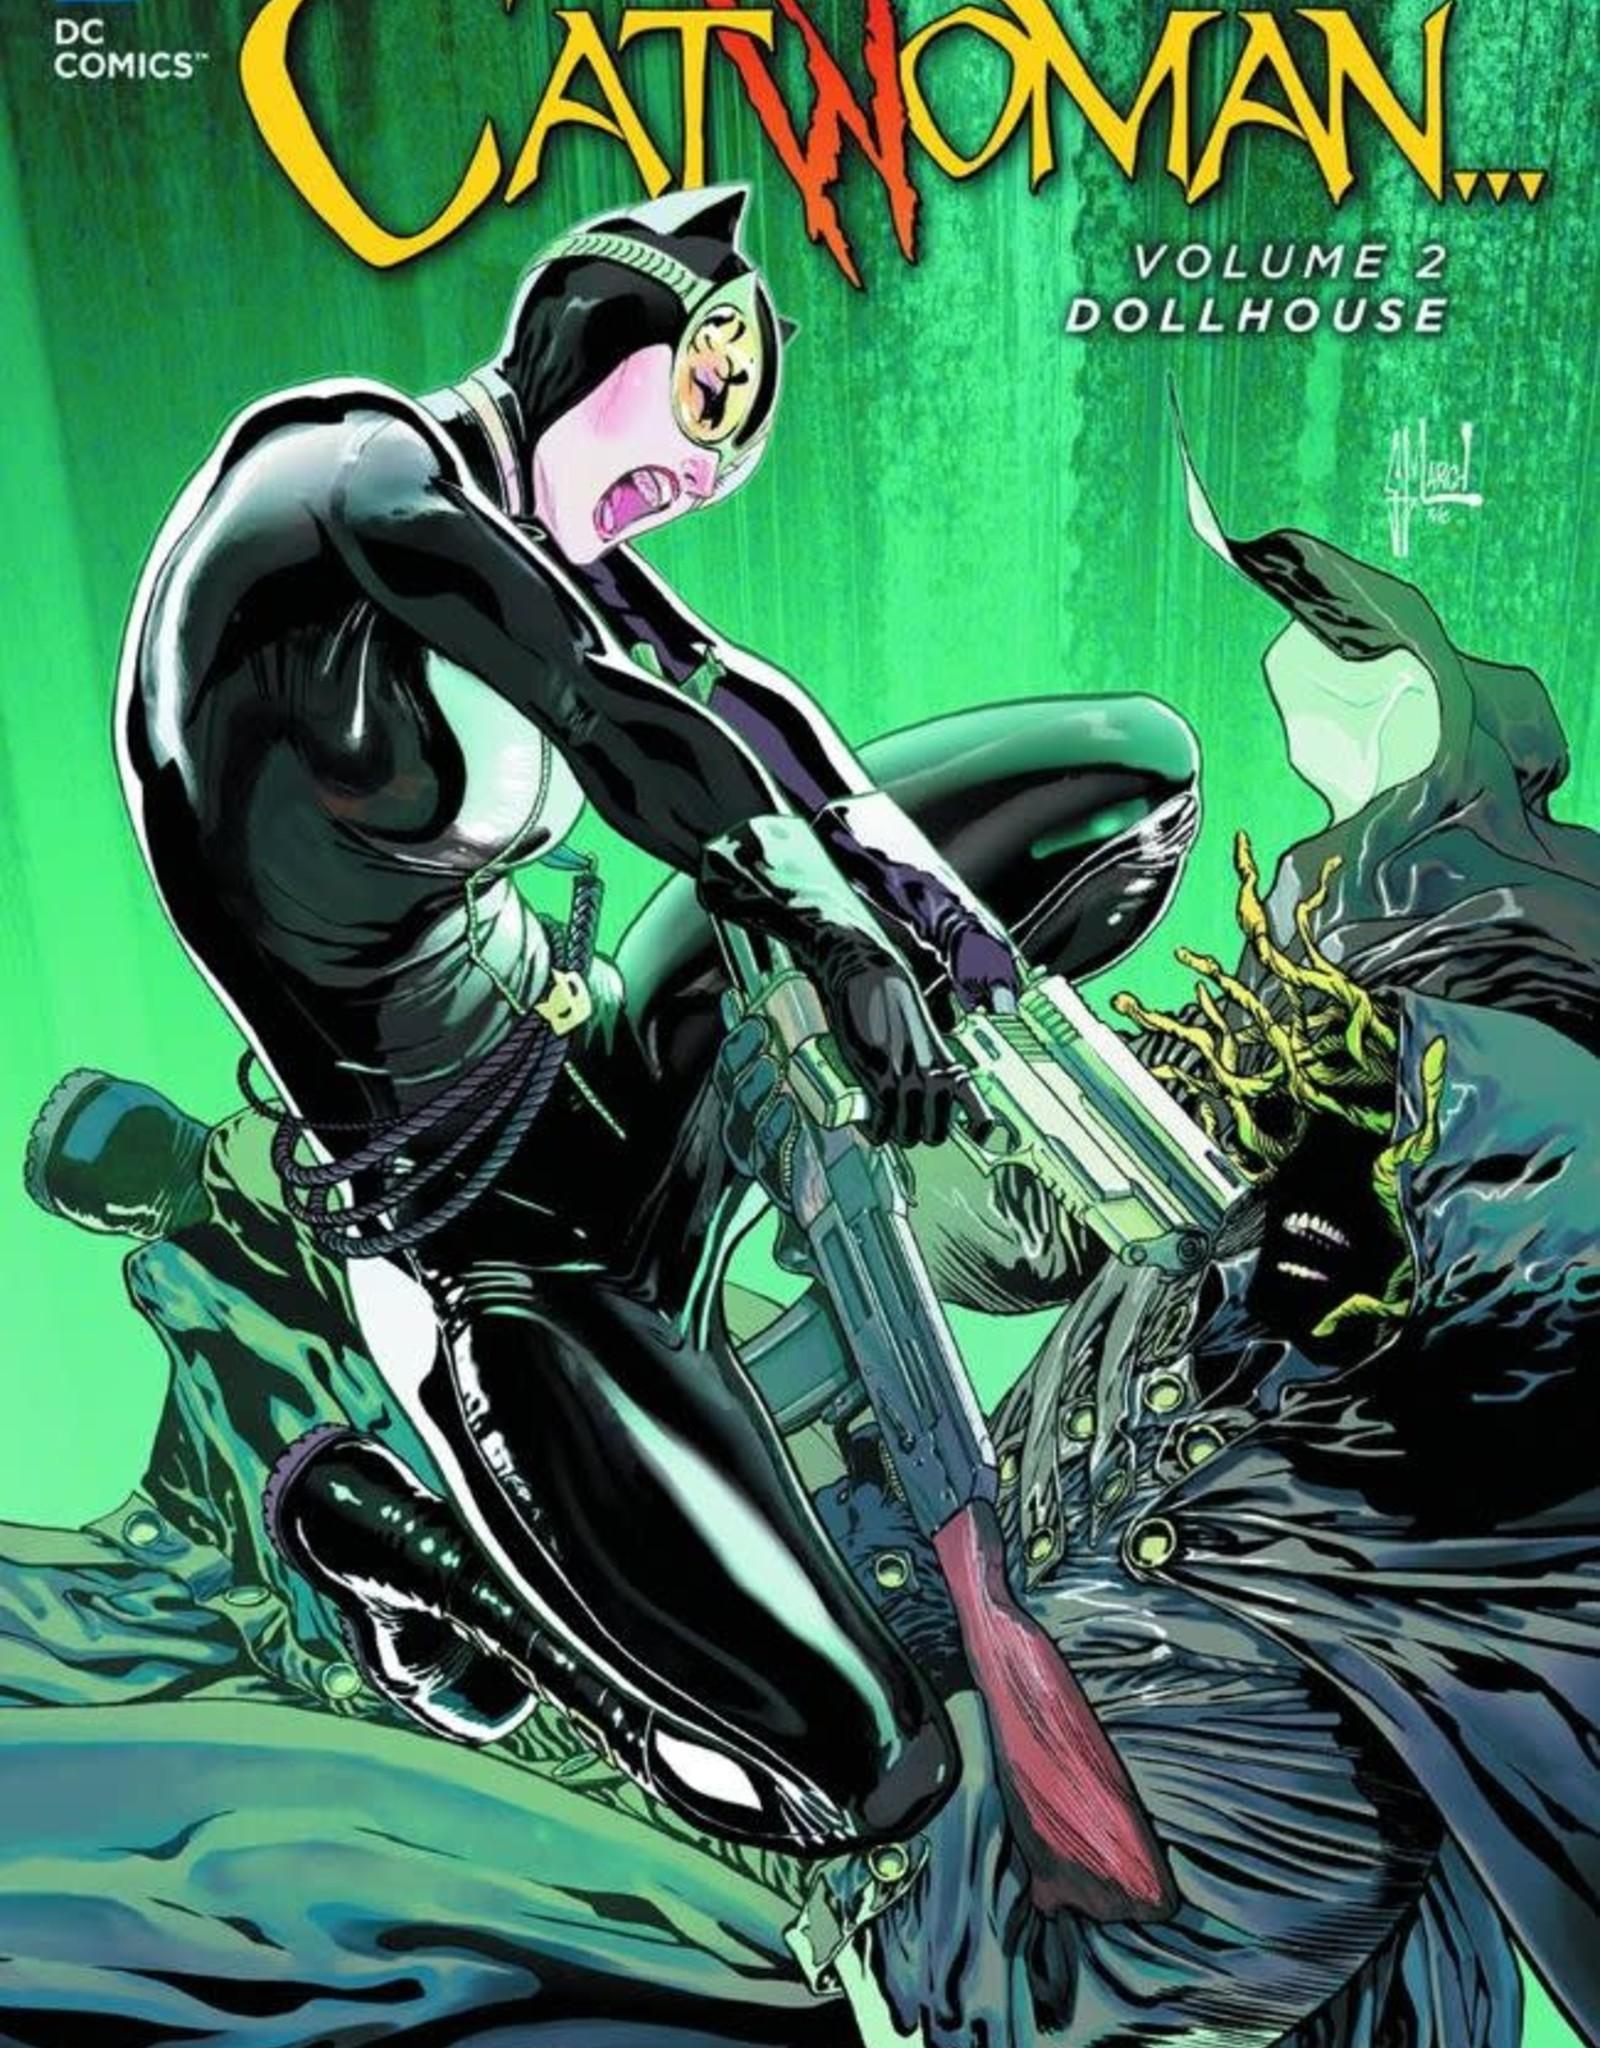 DC Comics Catwoman Vol 02: Dollhouse TP